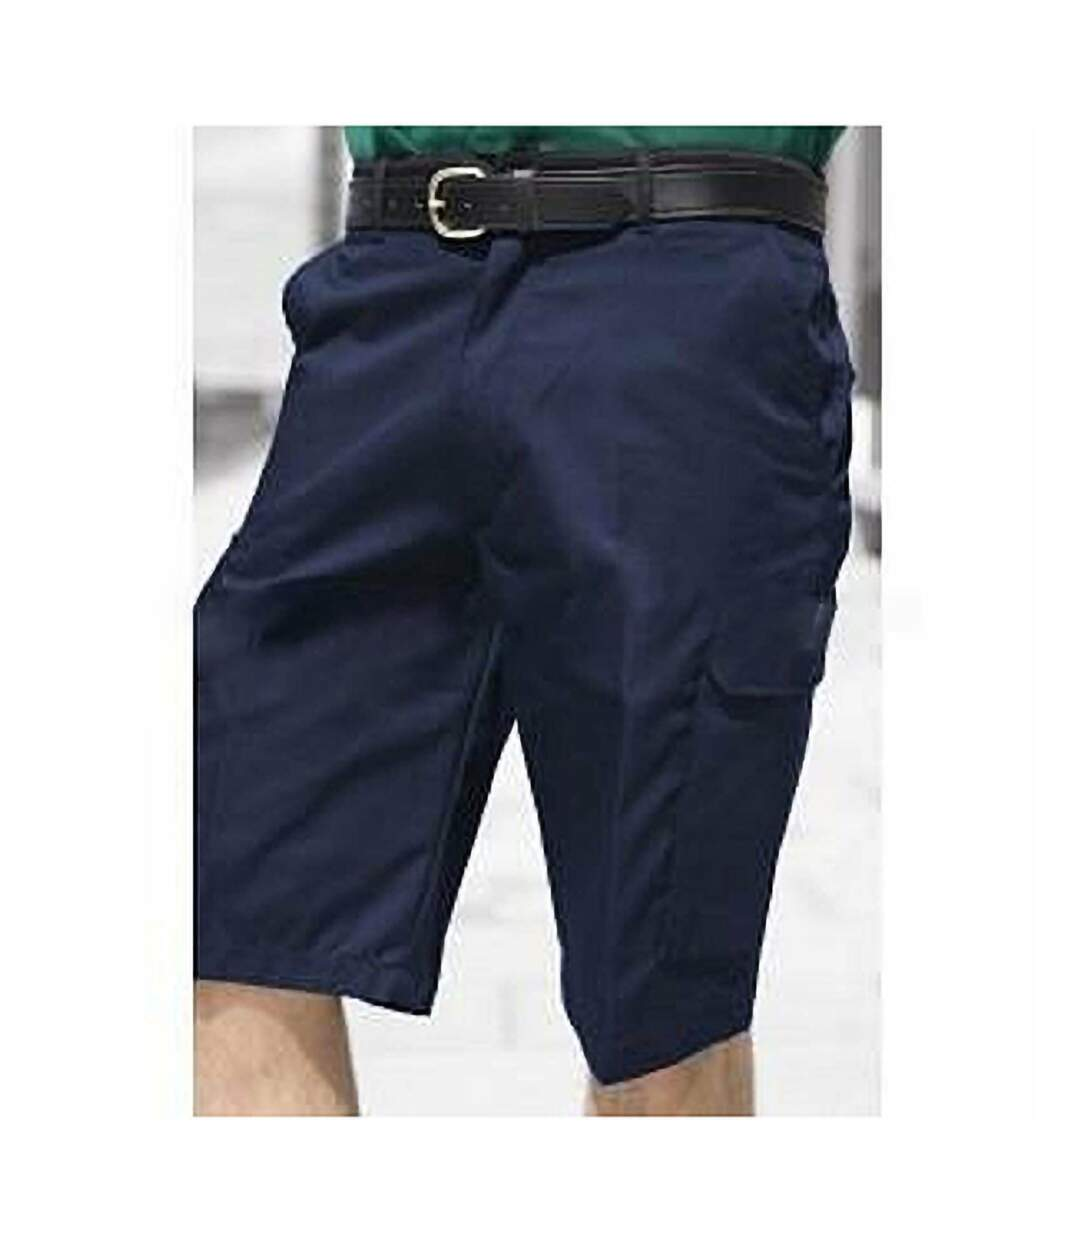 Warrior Mens Cargo Work Shorts (Harbour Navy) - UTPC142